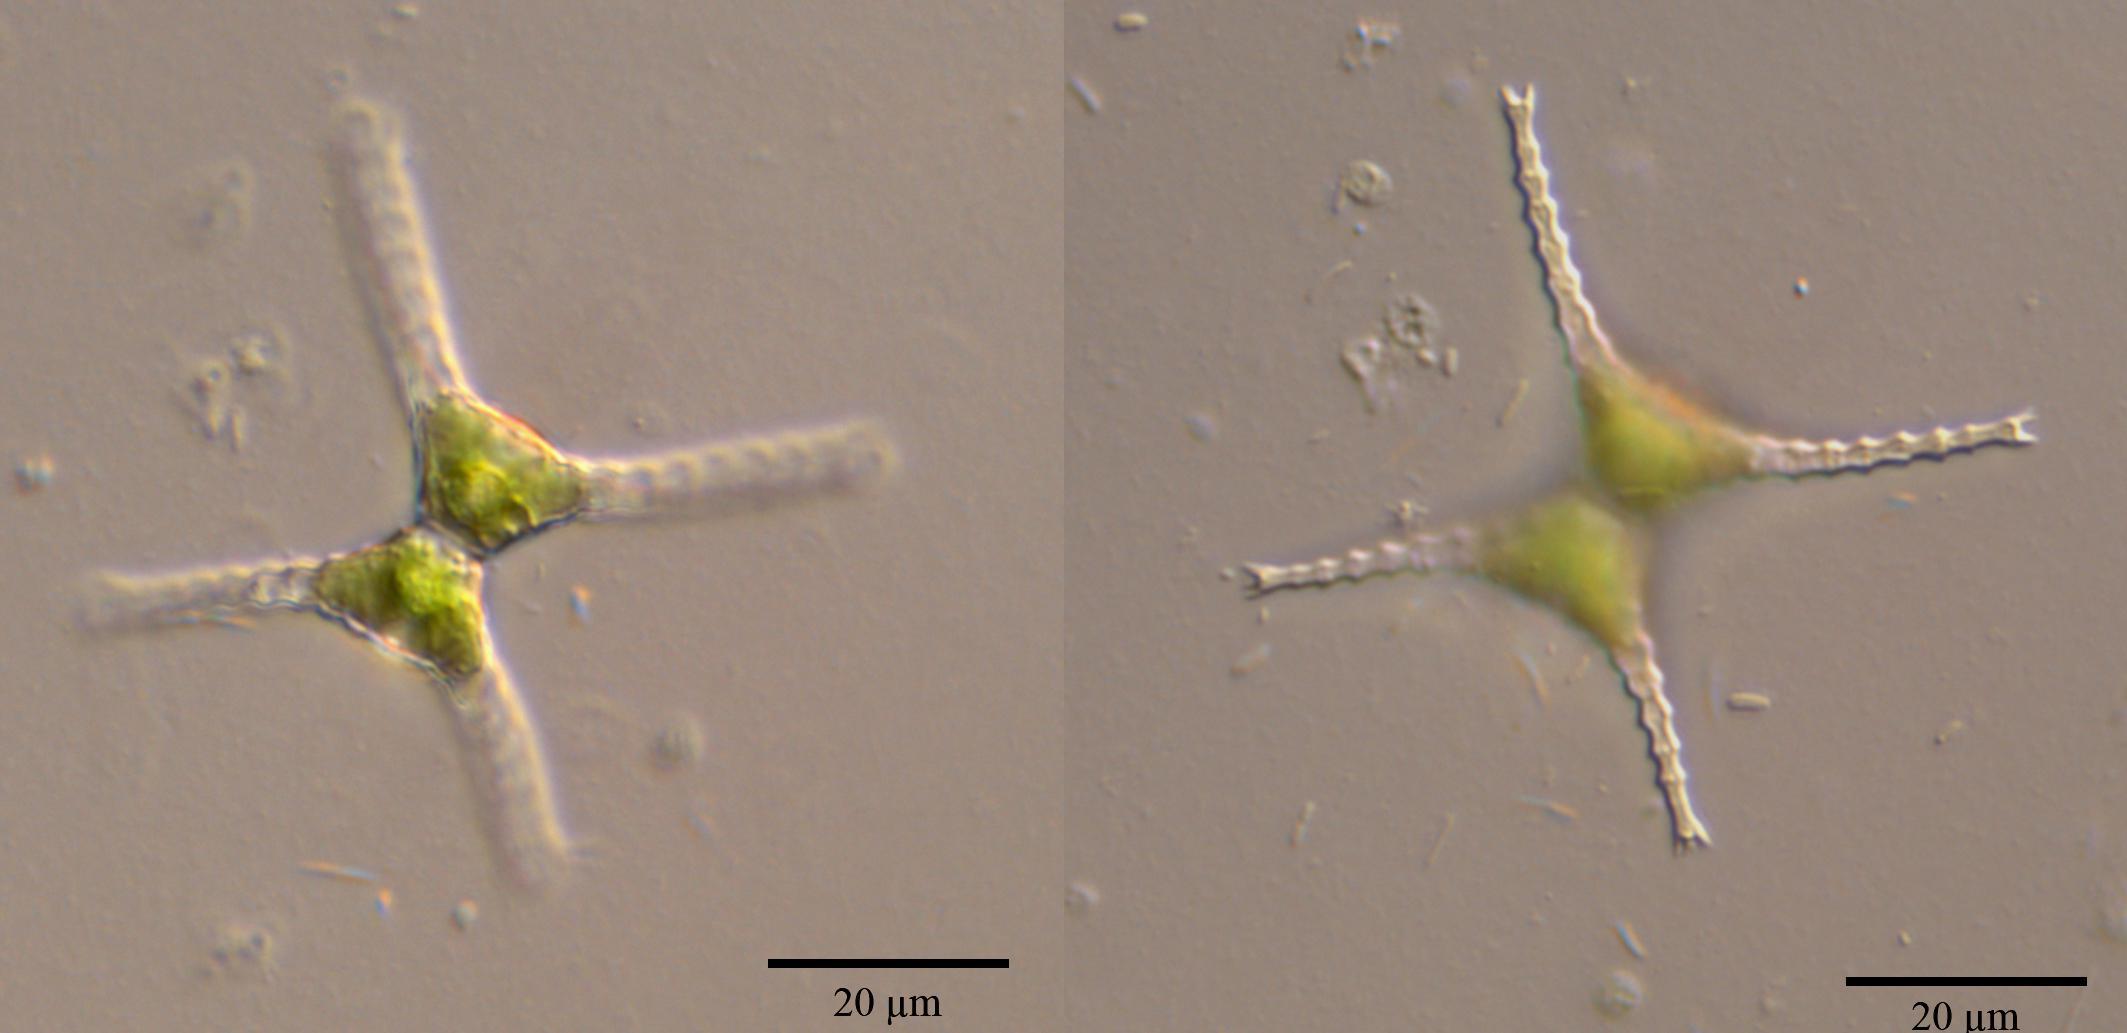 Staurastrum Chaetoceras Schr 246 D G M Sm Nordic Microalgae